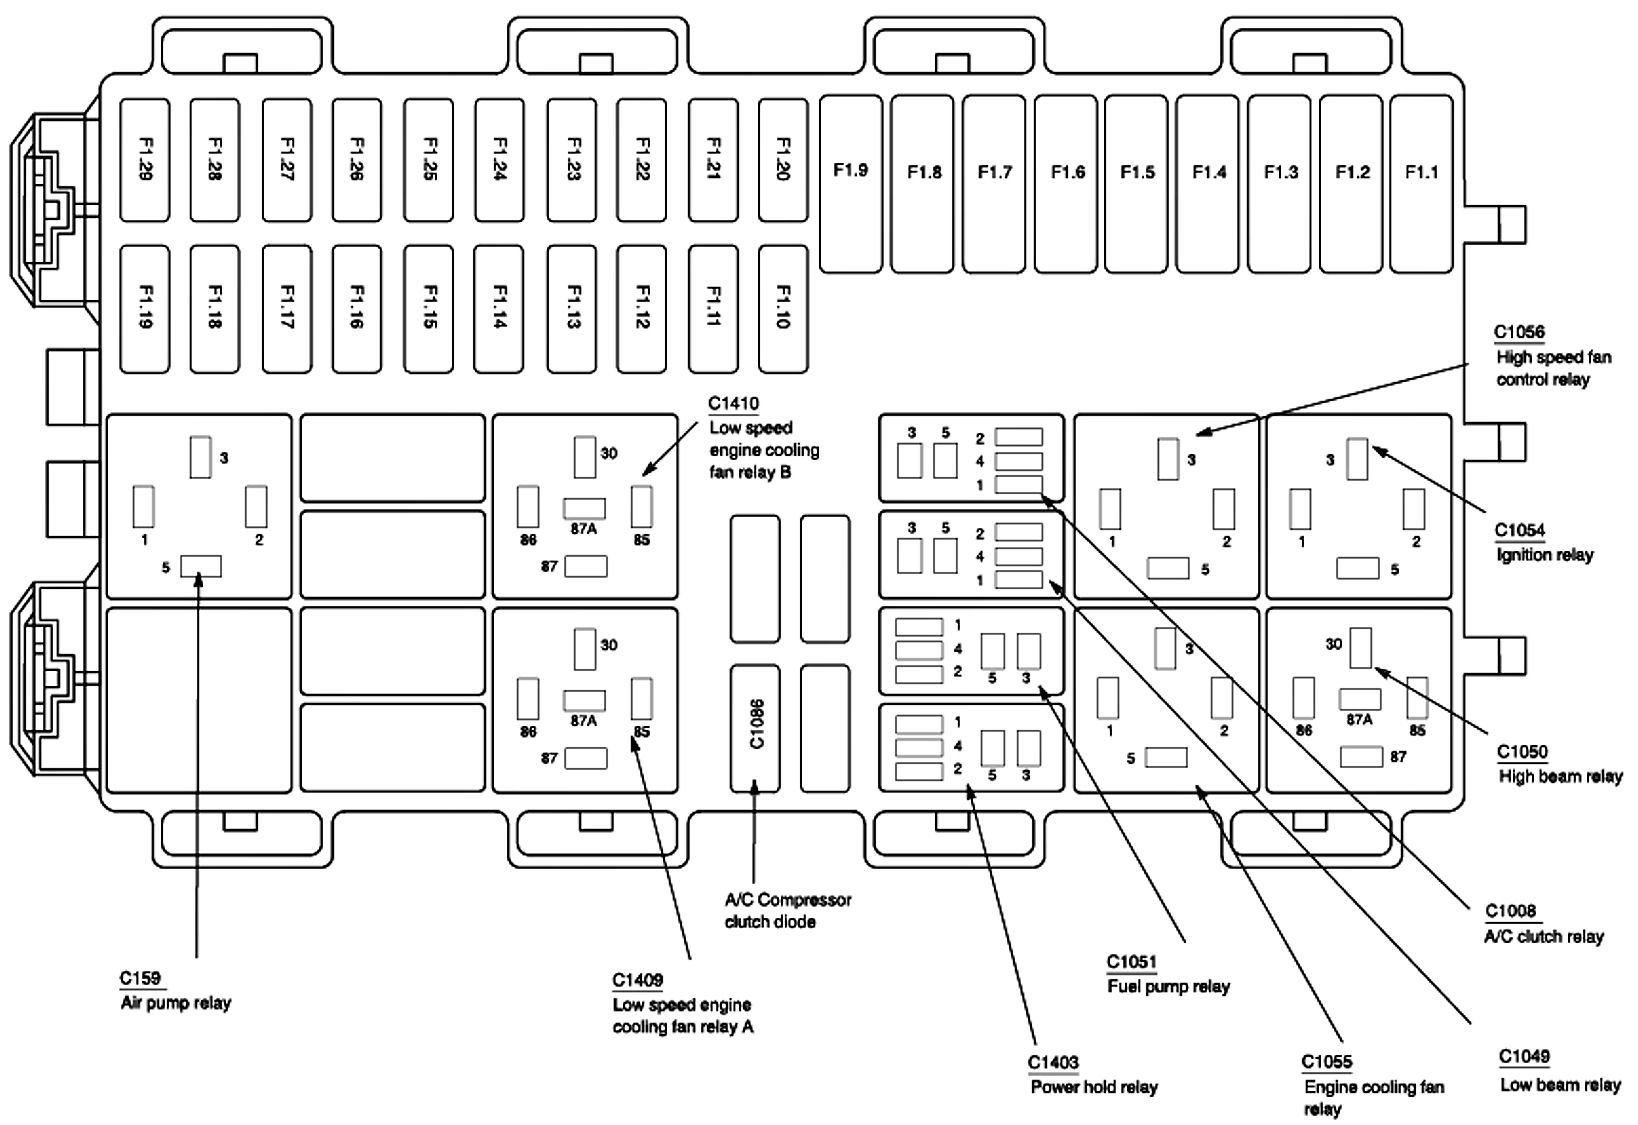 sv_8408] ford focus 1 6 zetec wiring diagram schematic wiring  aspi ifica inst simij chor mohammedshrine librar wiring 101